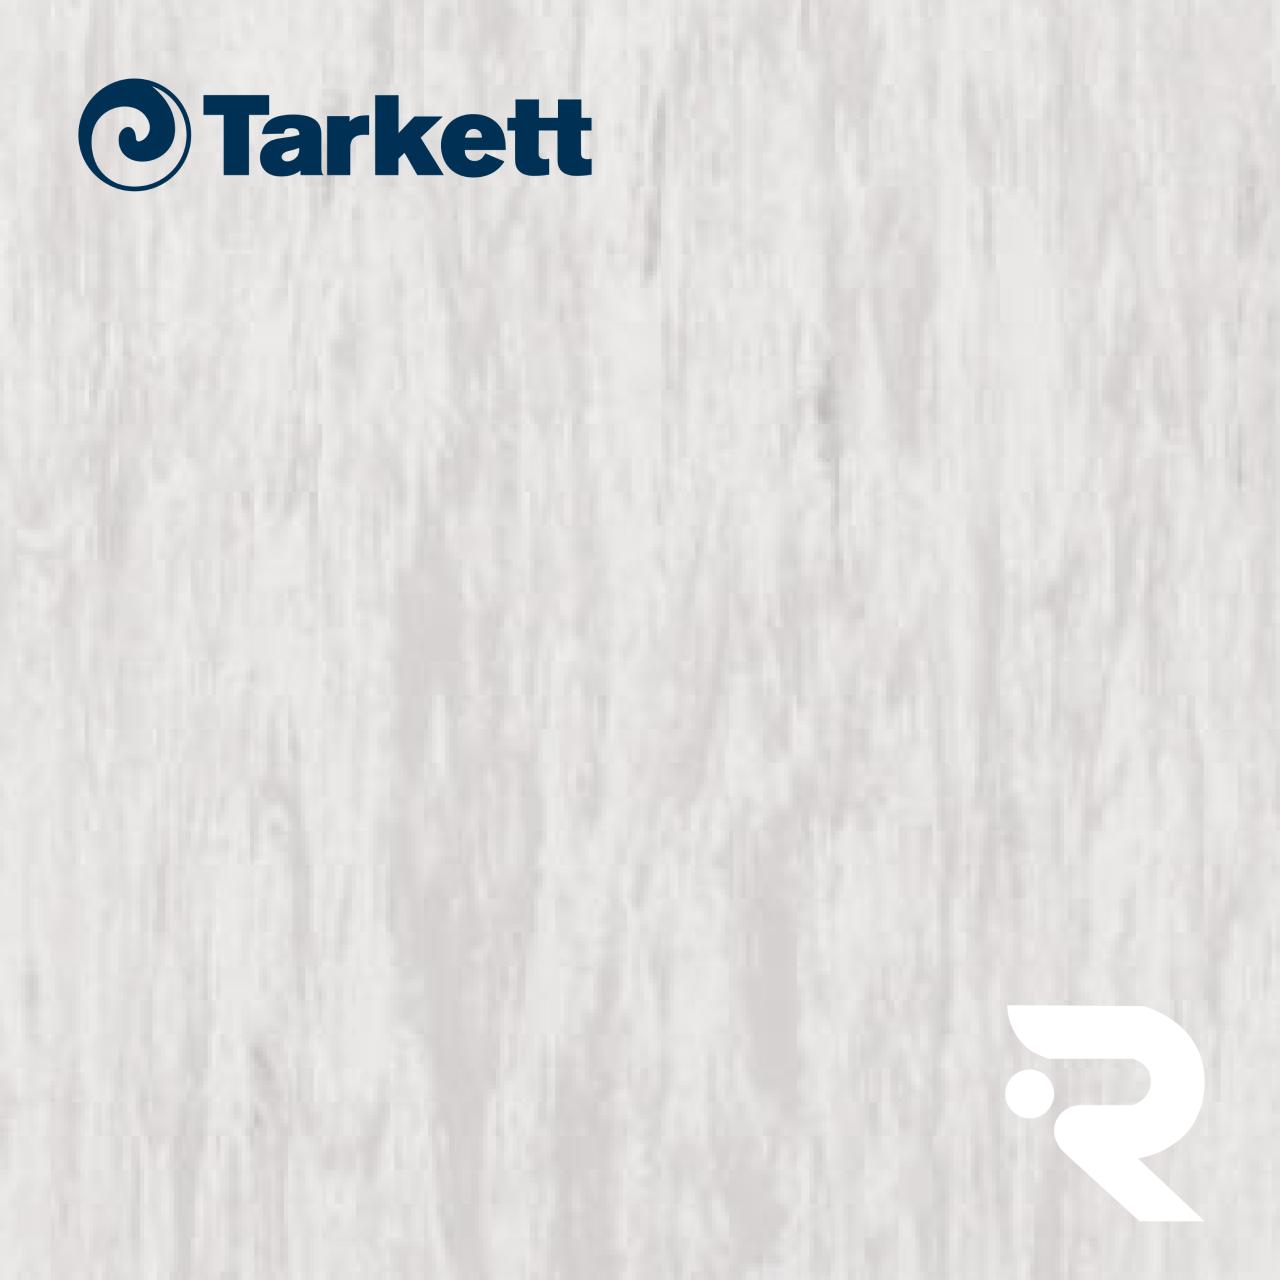 🏫 Гомогенный линолеум Tarkett | Standard LIGHT GREY 0497 | Standard Plus 2.0 mm | 2 х 23 м